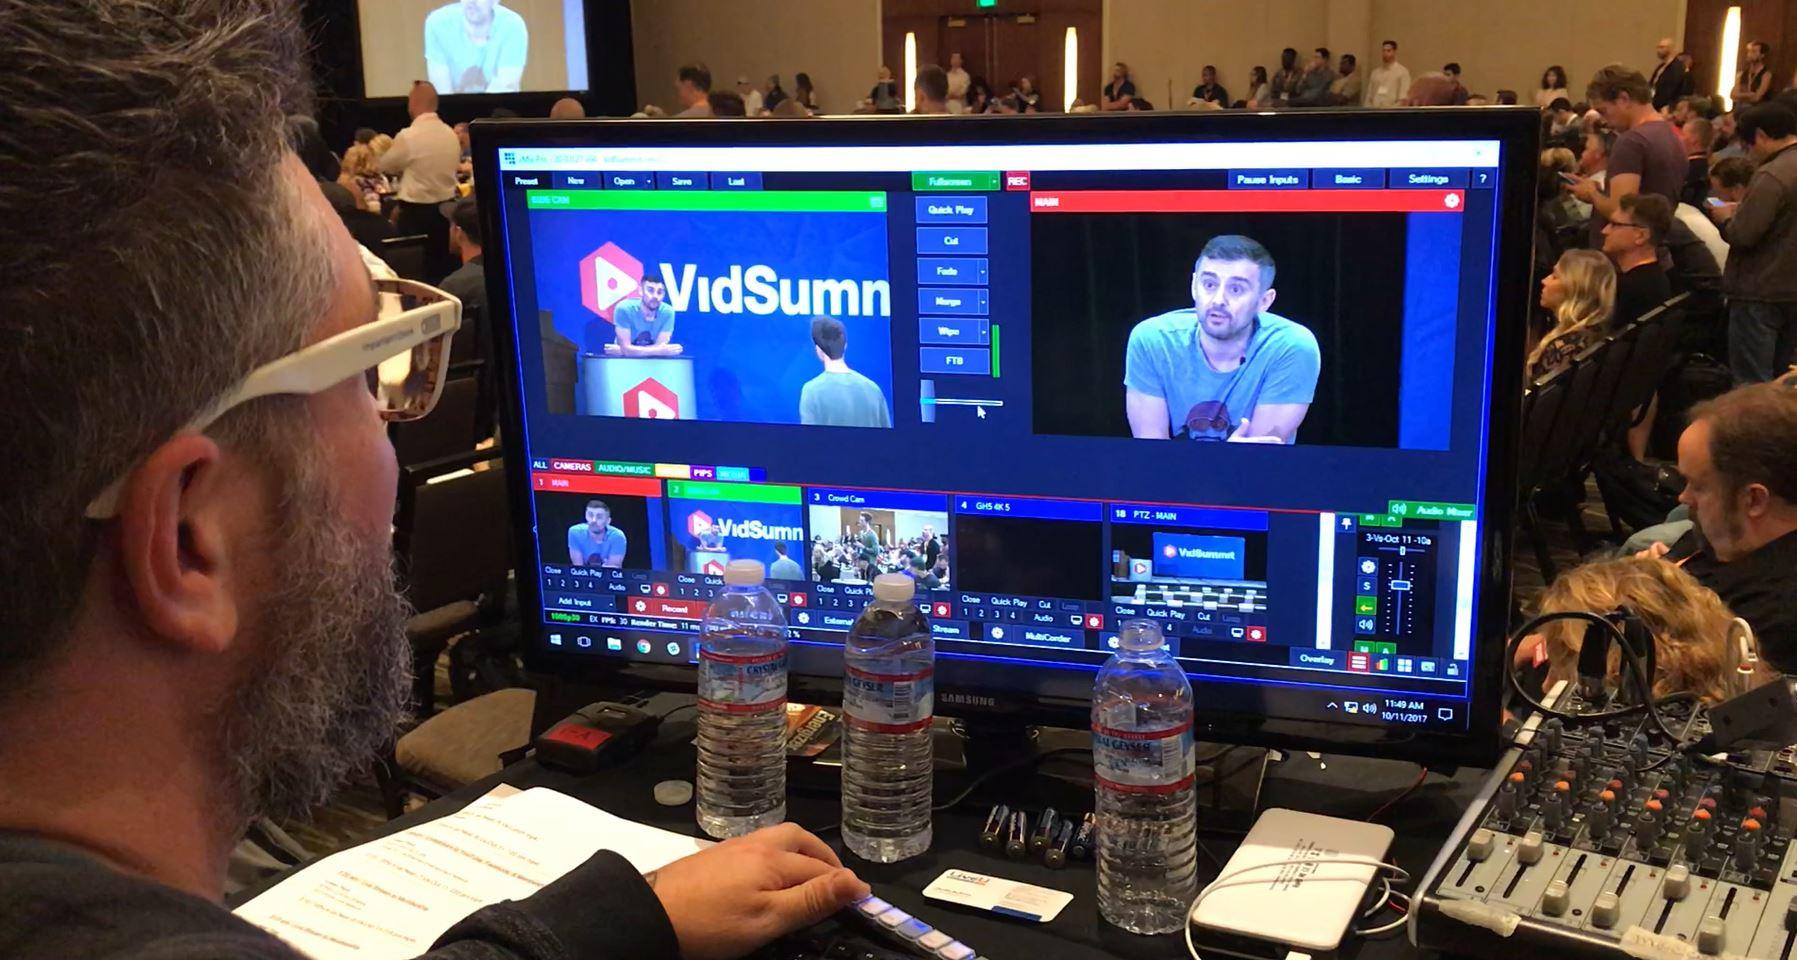 live-streaming-cameras-on-gary.jpg